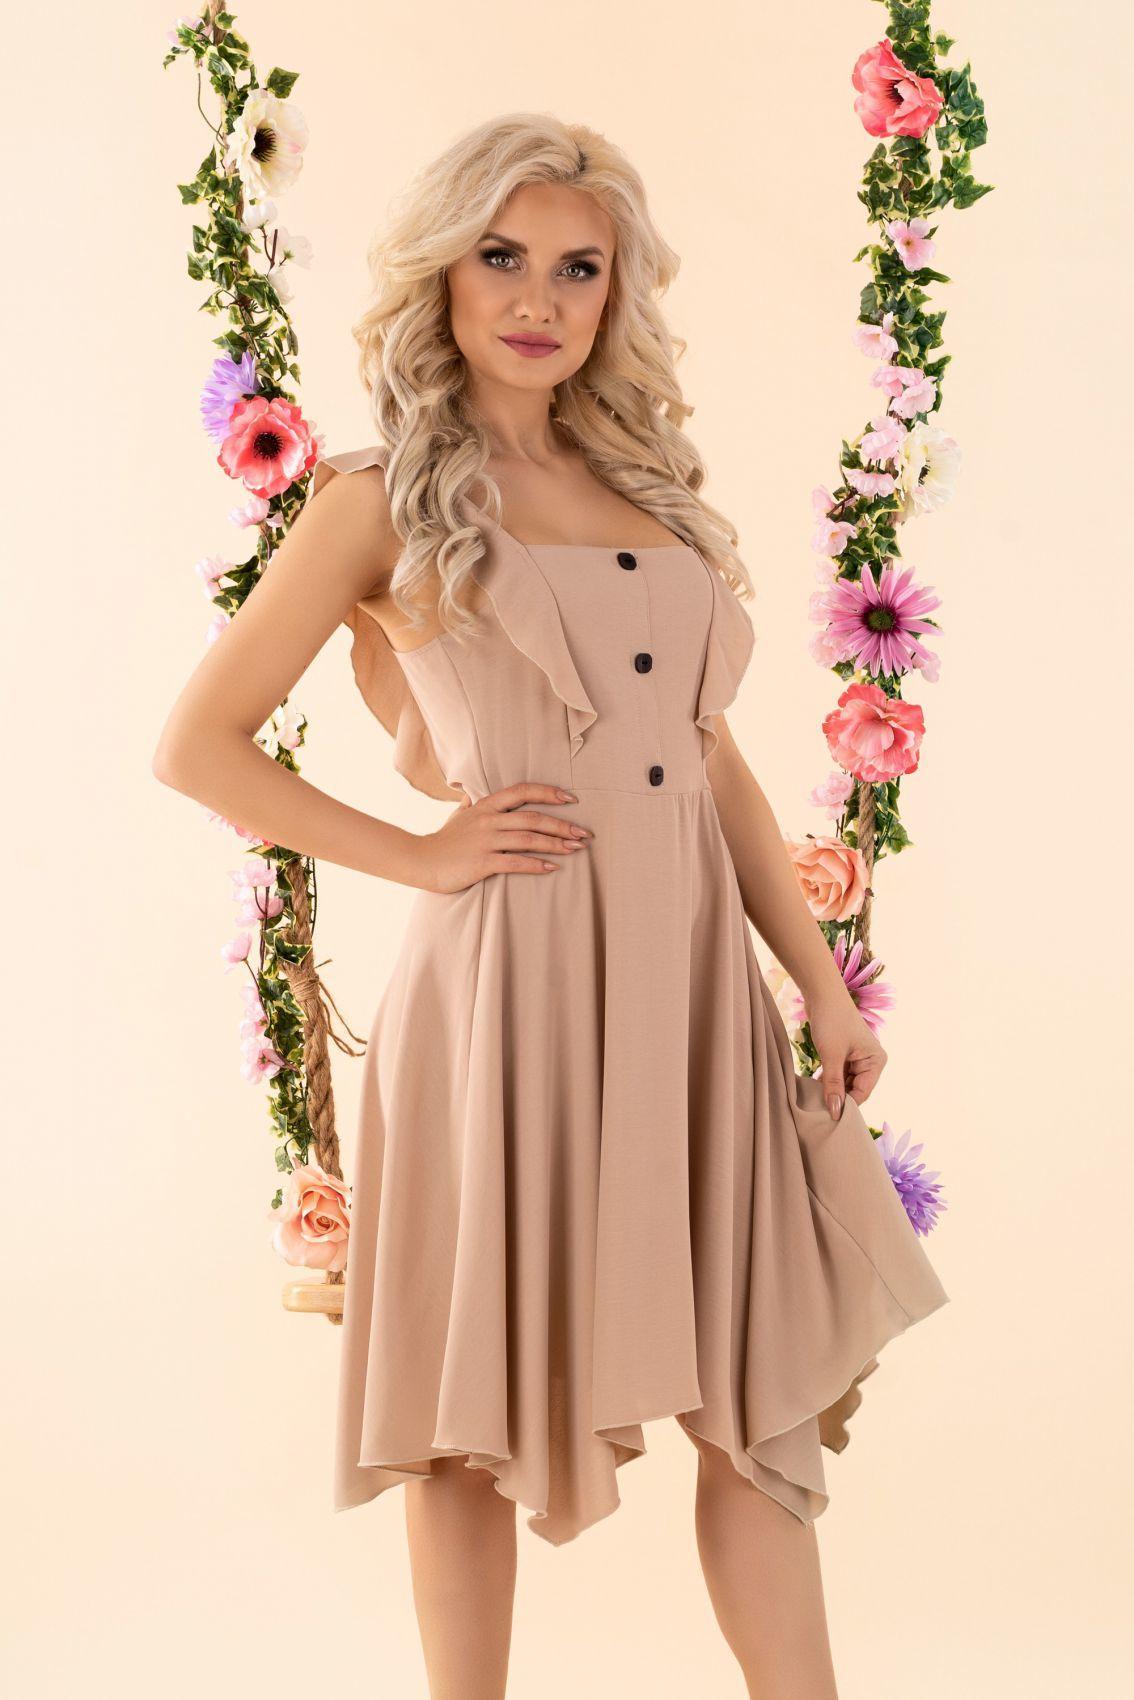 Quellama Beige D54 sukienka